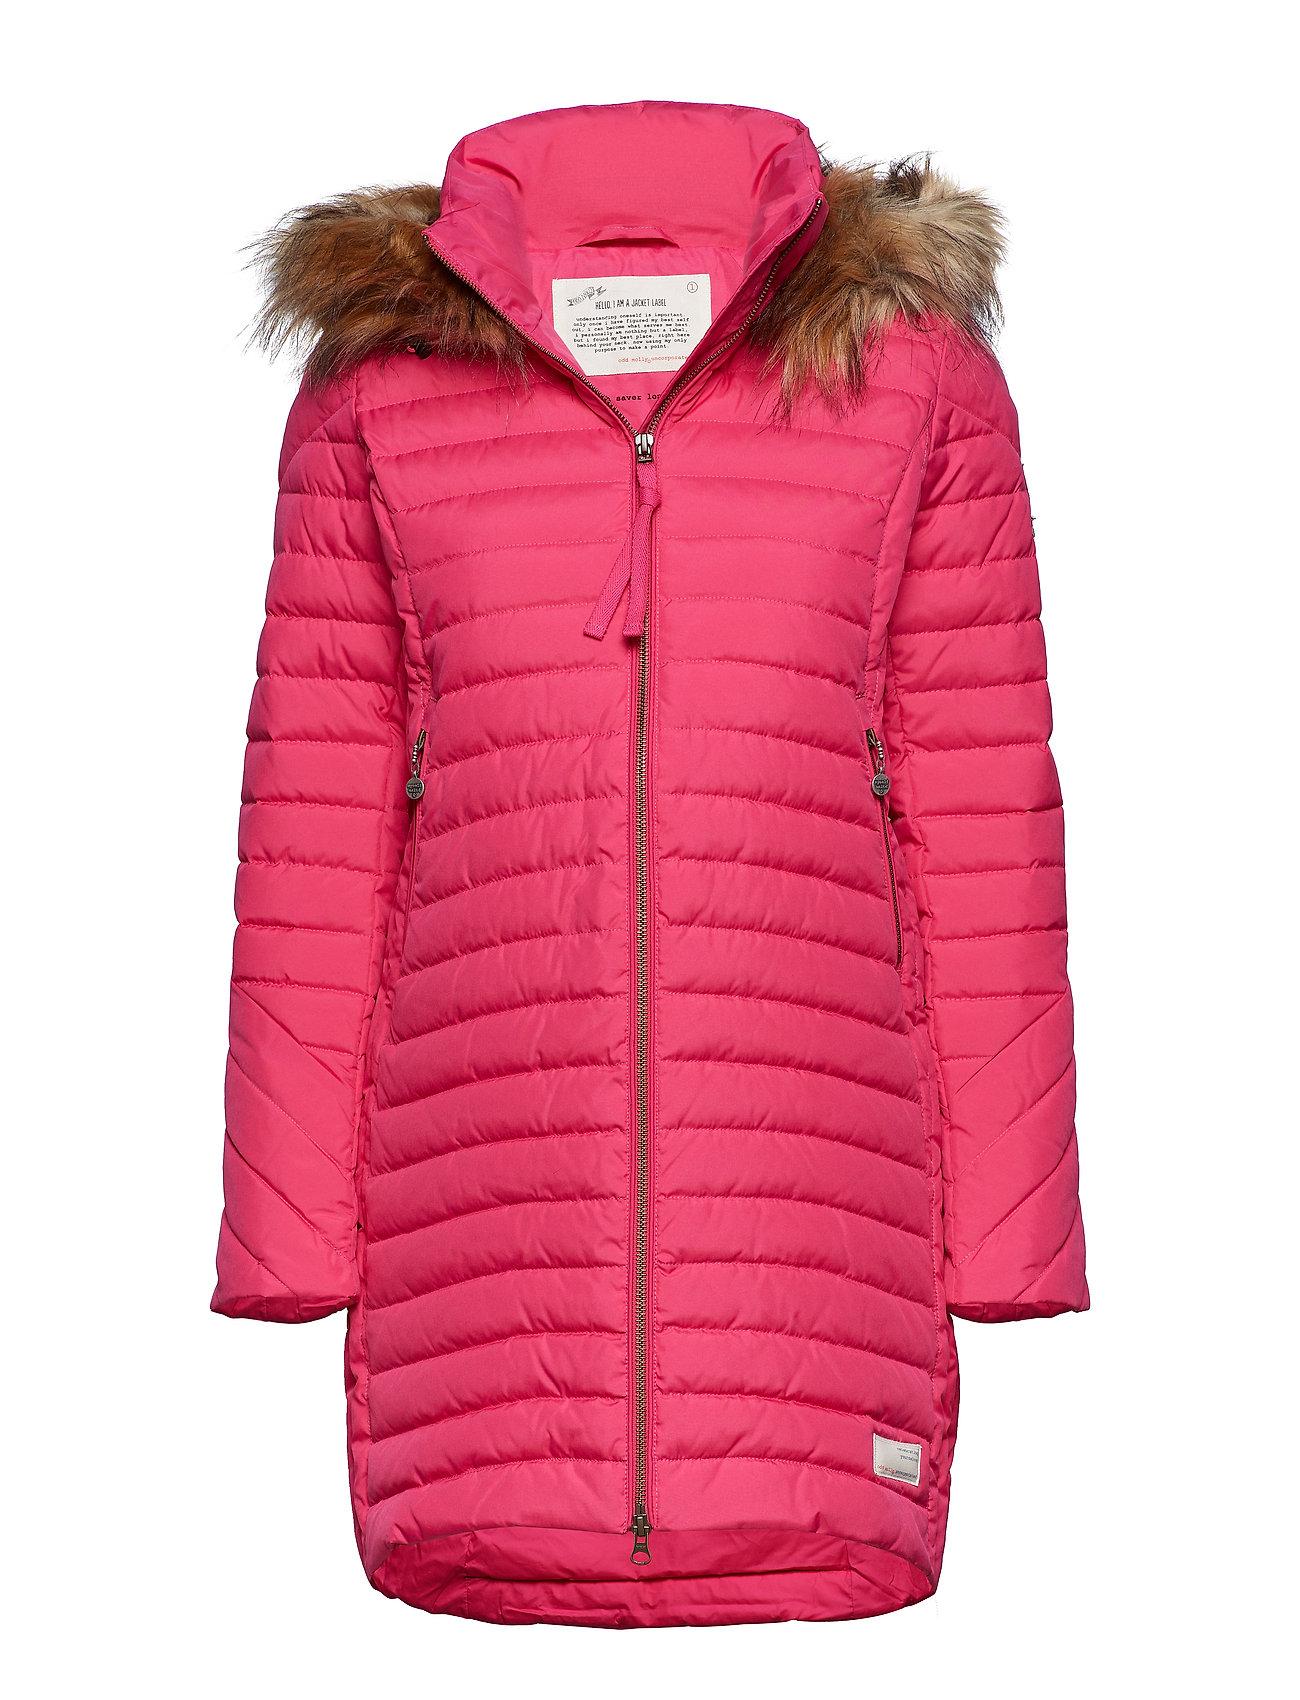 ODD MOLLY ACTIVE WEAR earth saver long jacket - HOT PINK